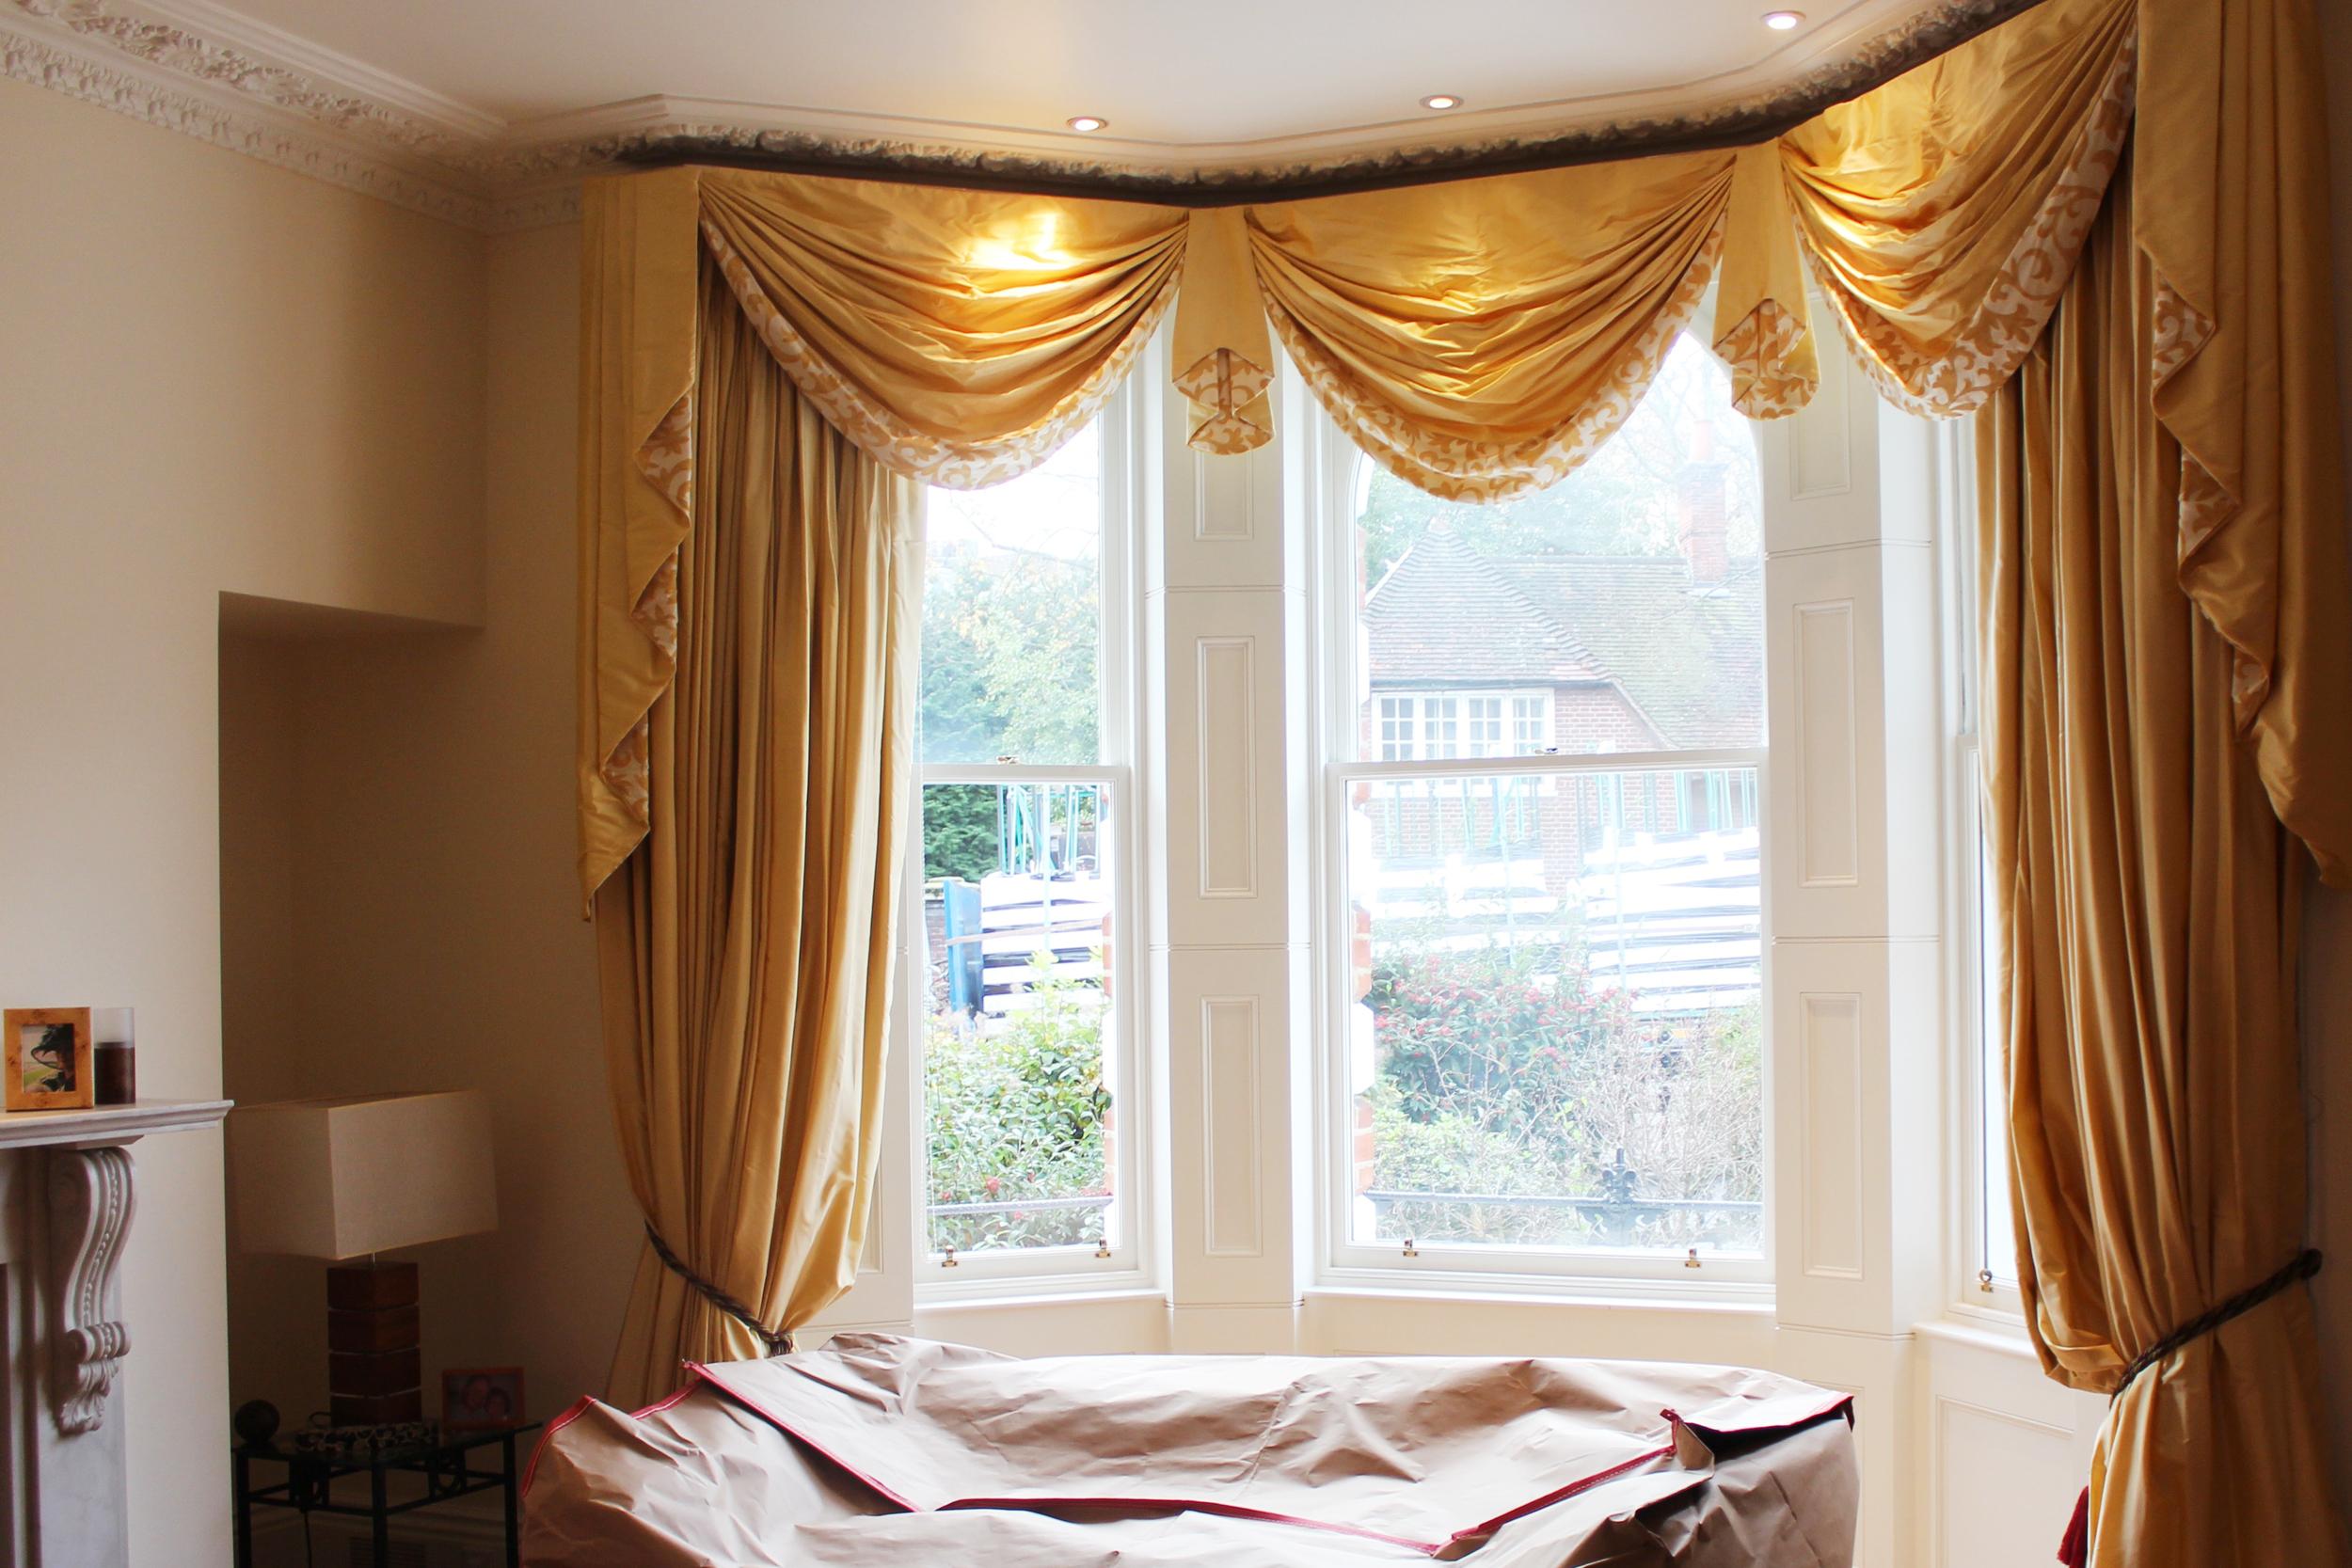 #NHRenovations #Painter #Decorator #London #Kensington #Knightsbridge #Windows #Farrowandball #Farrow #Allwhite #Ceilings #Woodwork #Tallow #Walls #eggshell